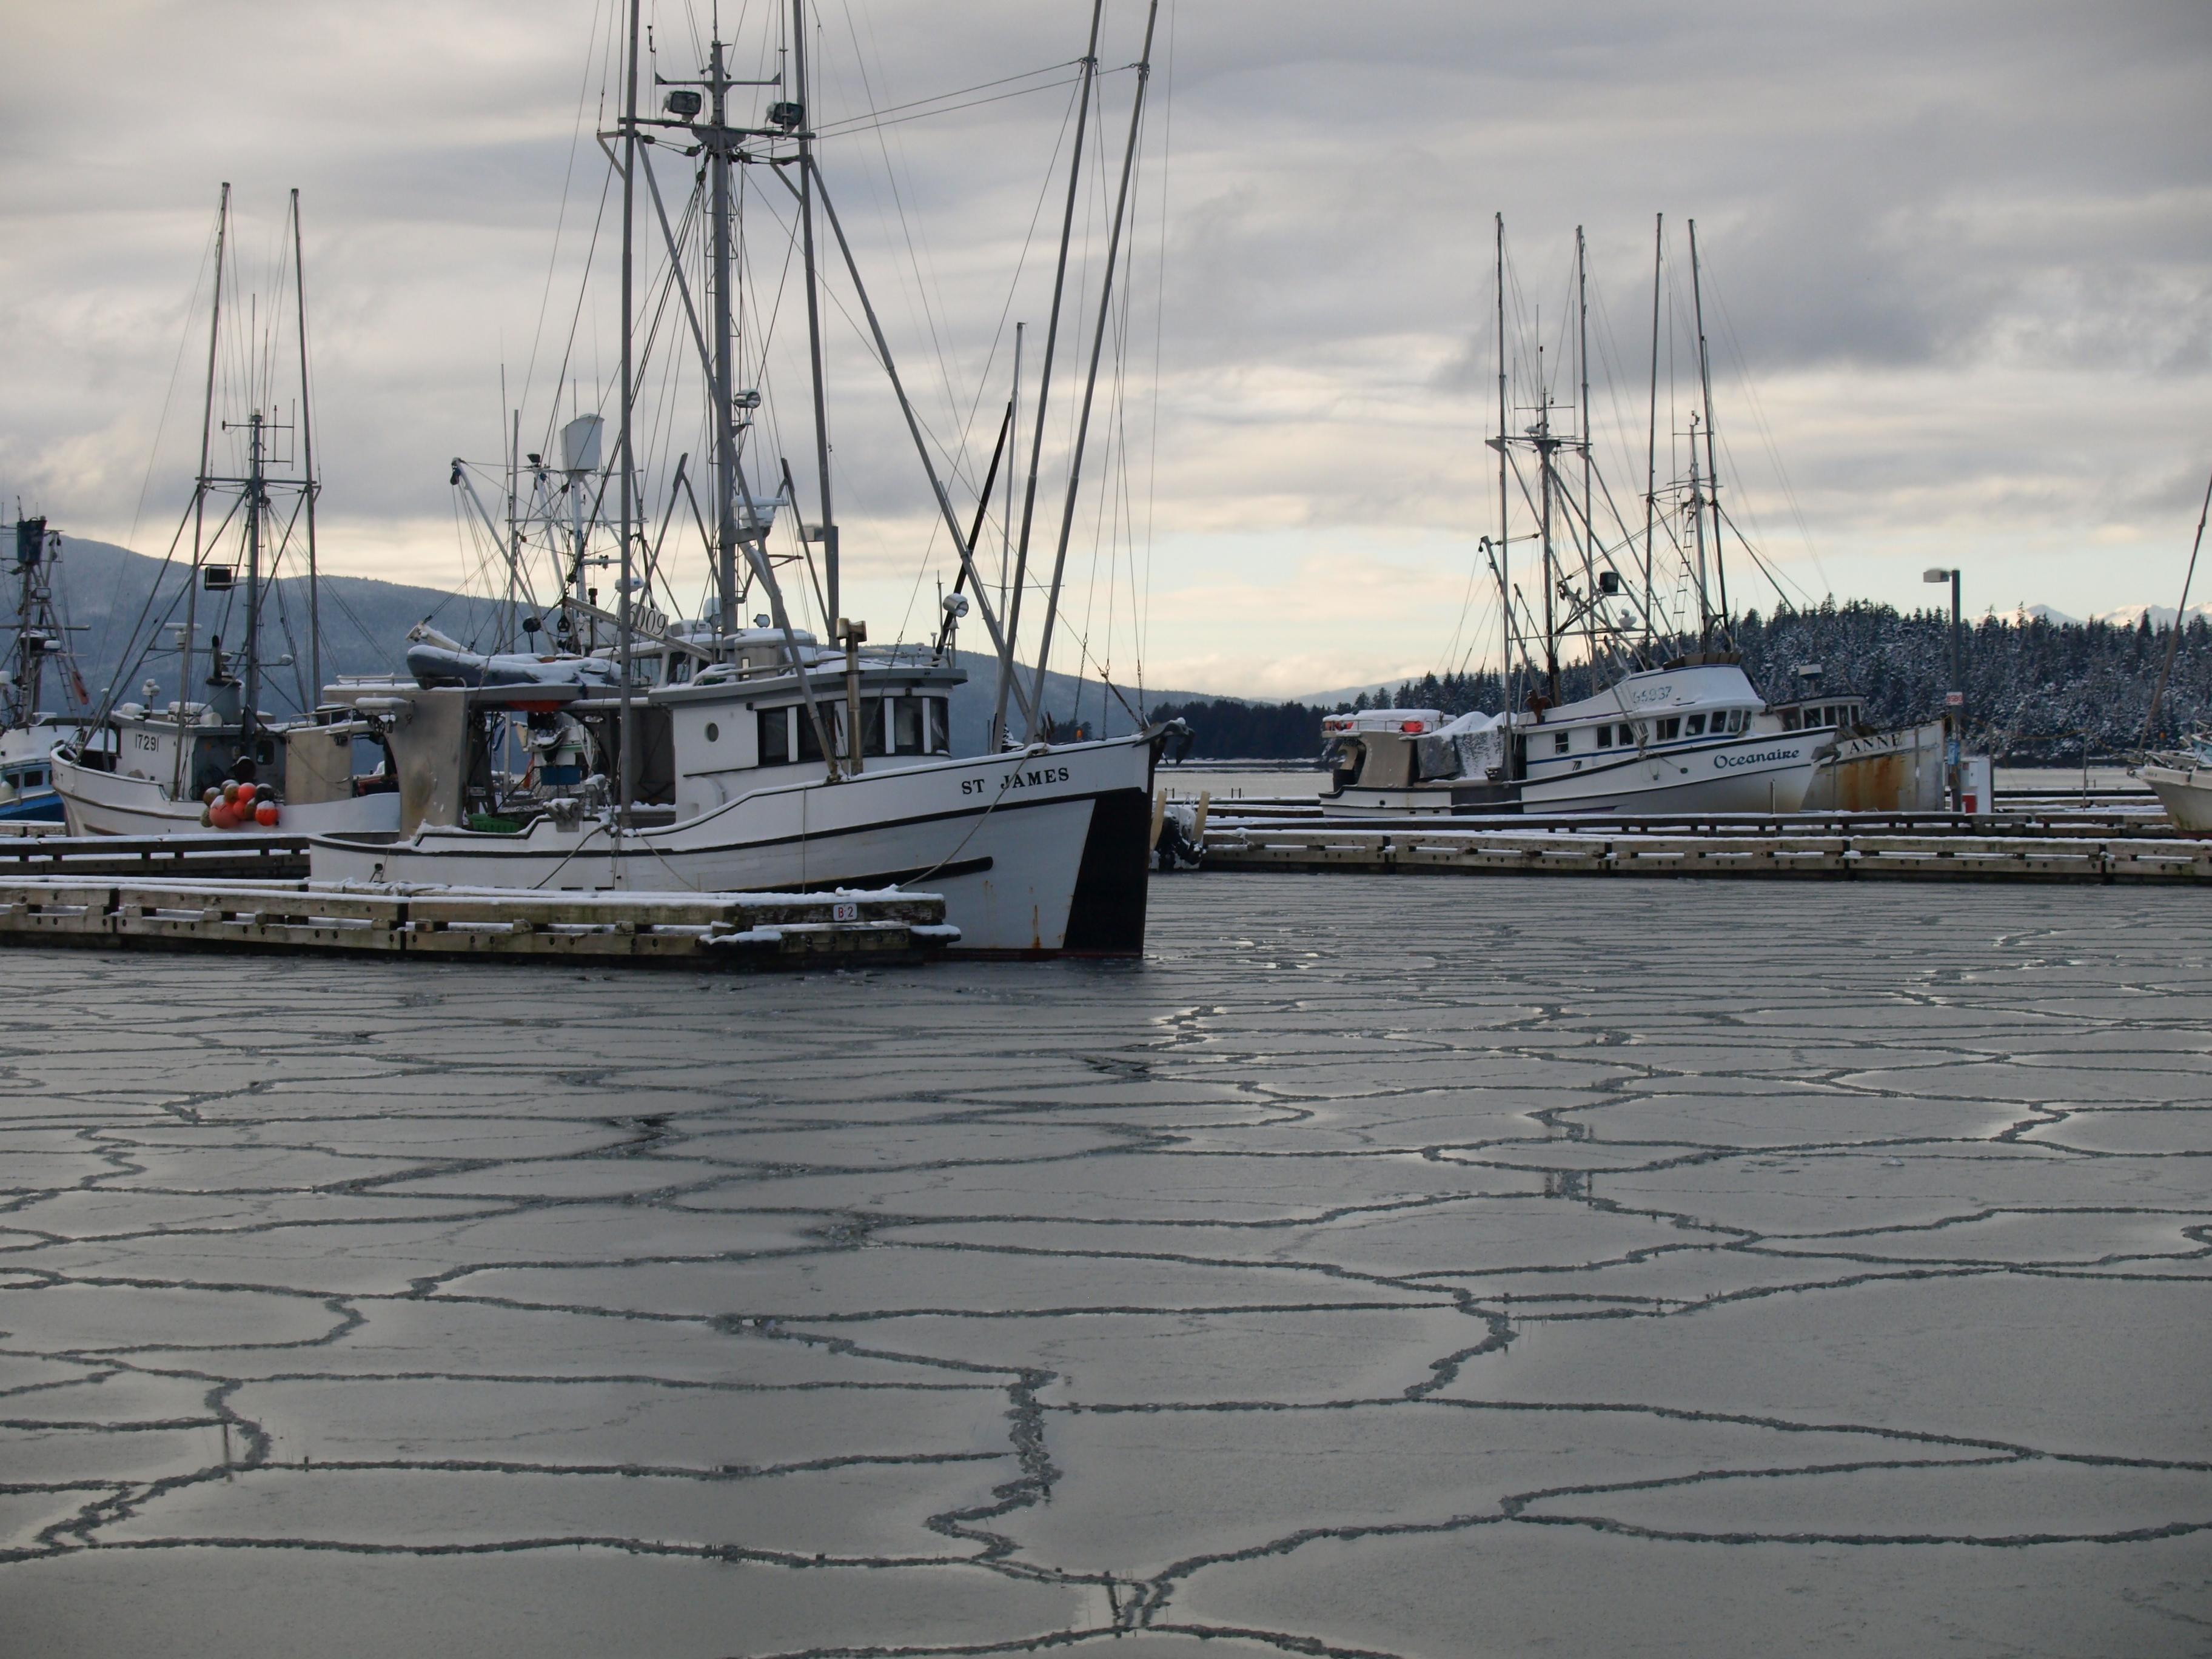 Frozen harbor photo